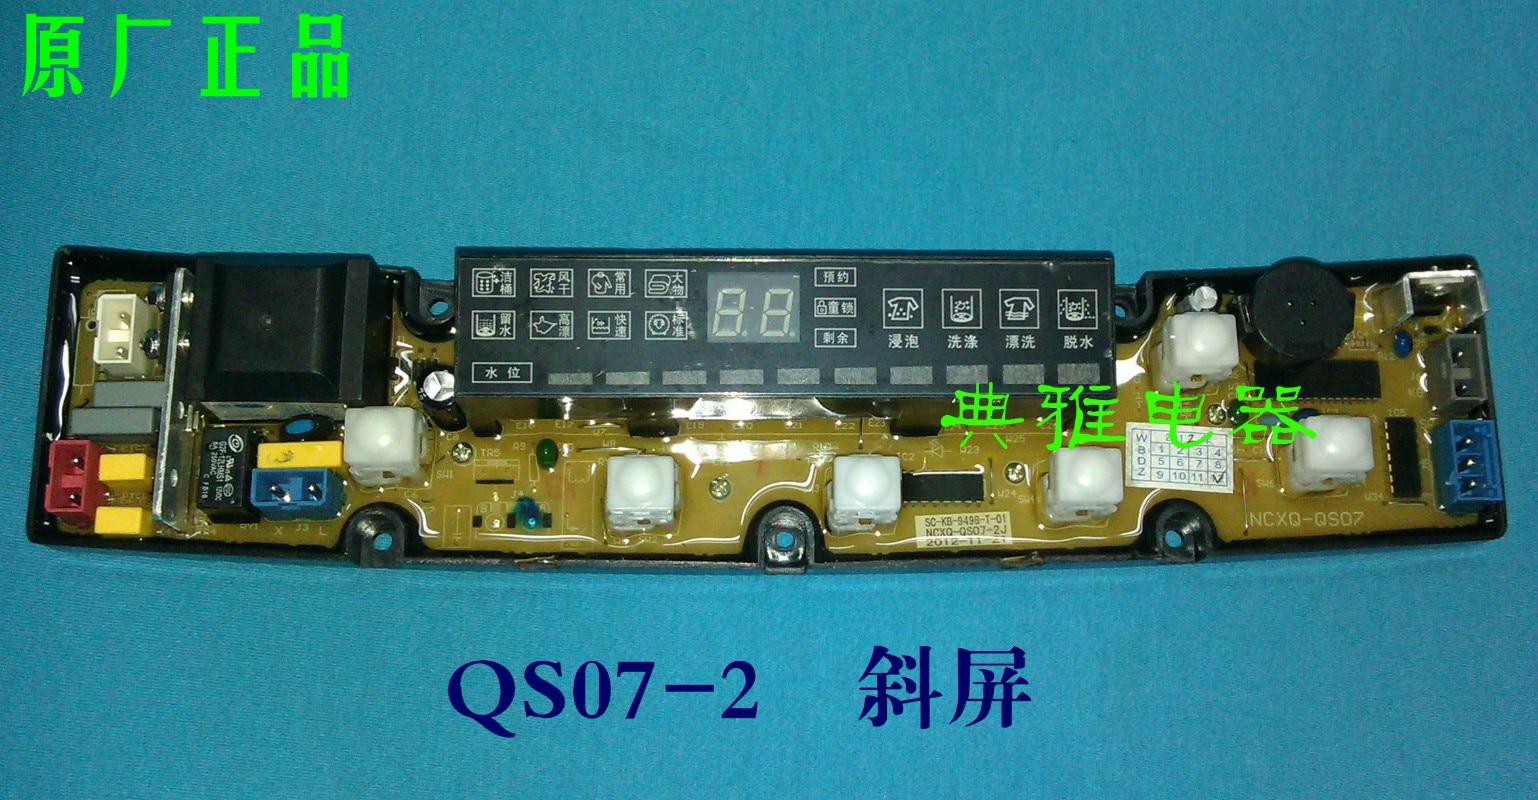 Washing machine board xqb72-78 original motherboard ncxq-qs07-2 qs07-2 screen abc board 5wwm 78